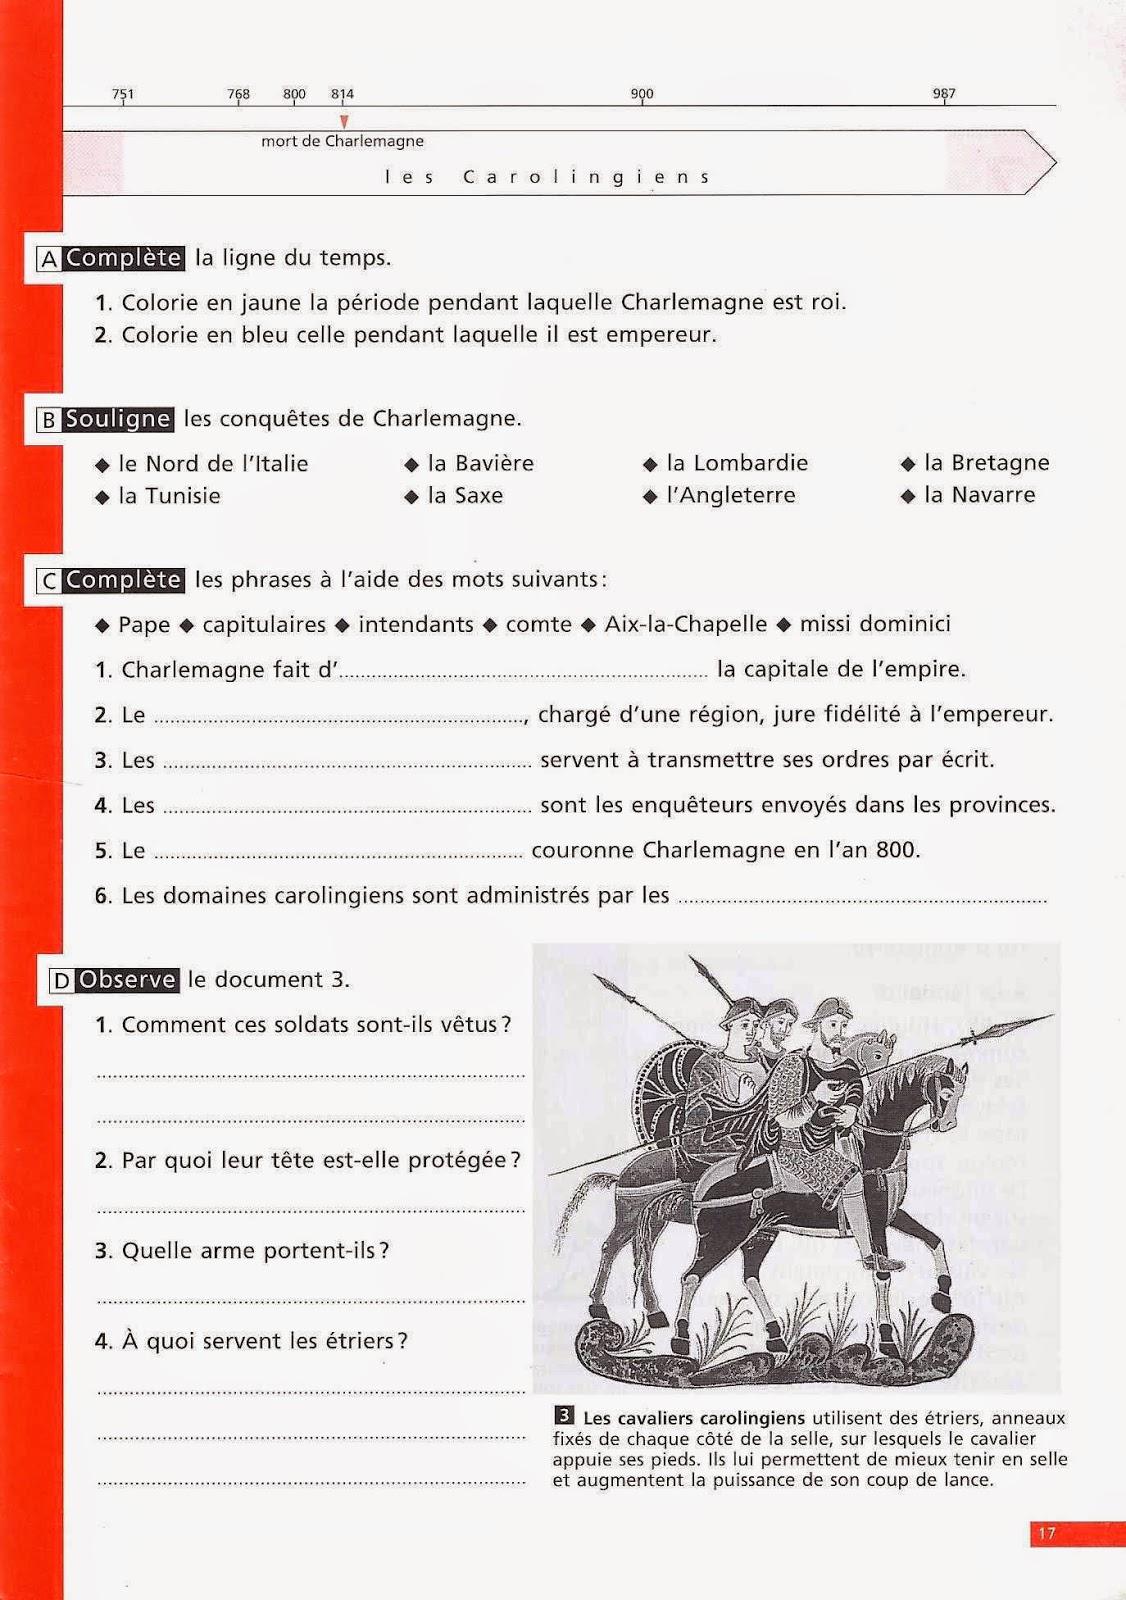 manuels anciens histoire de france cm1 programmes 1995. Black Bedroom Furniture Sets. Home Design Ideas